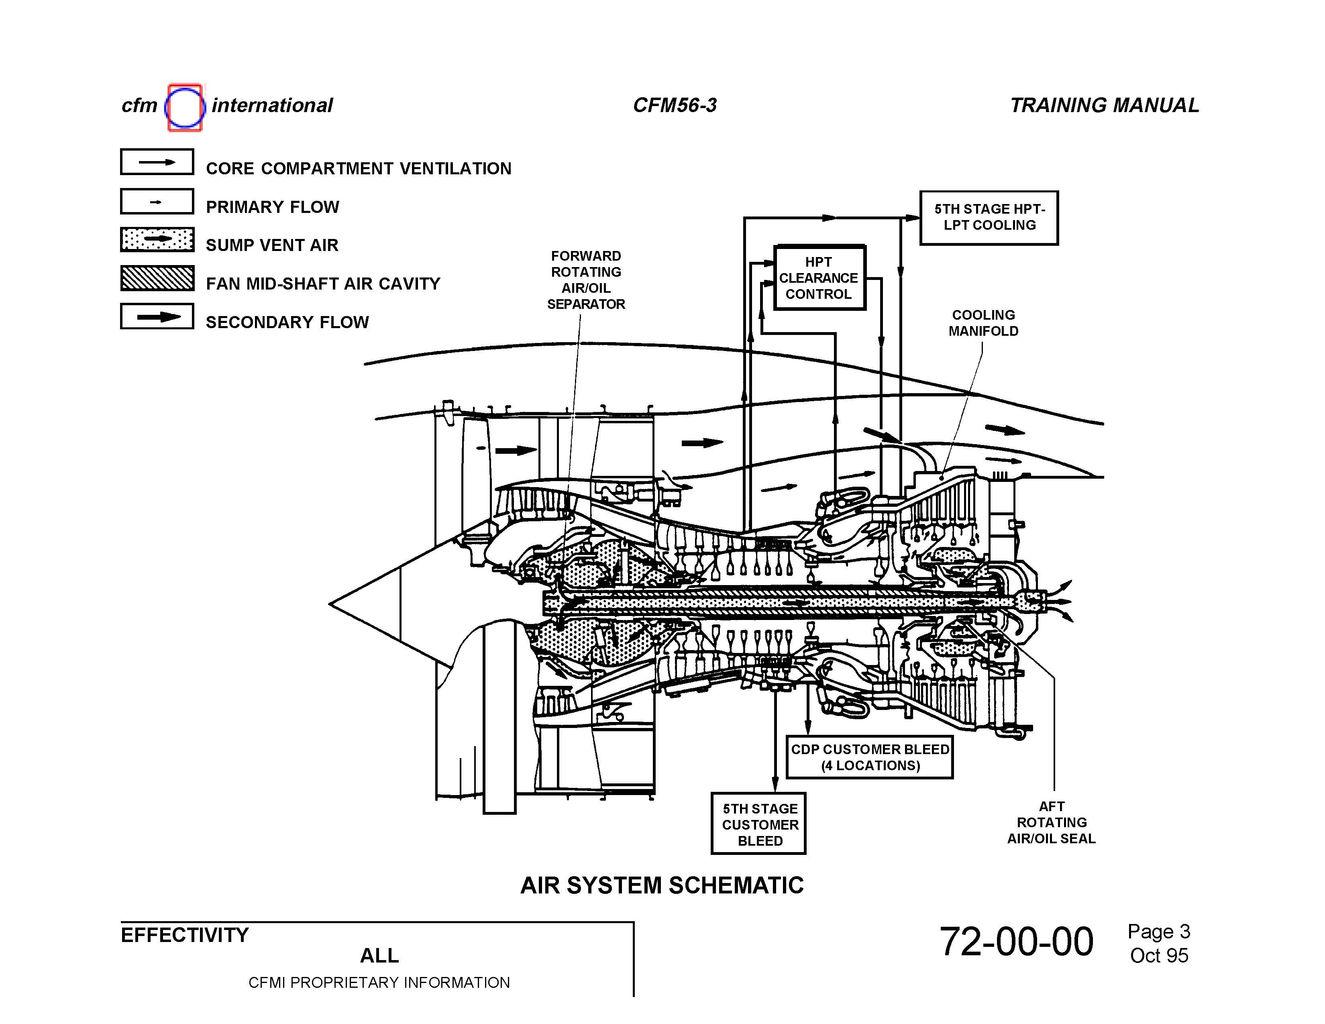 Boeing 787 Aircraft Maintenance Manual on